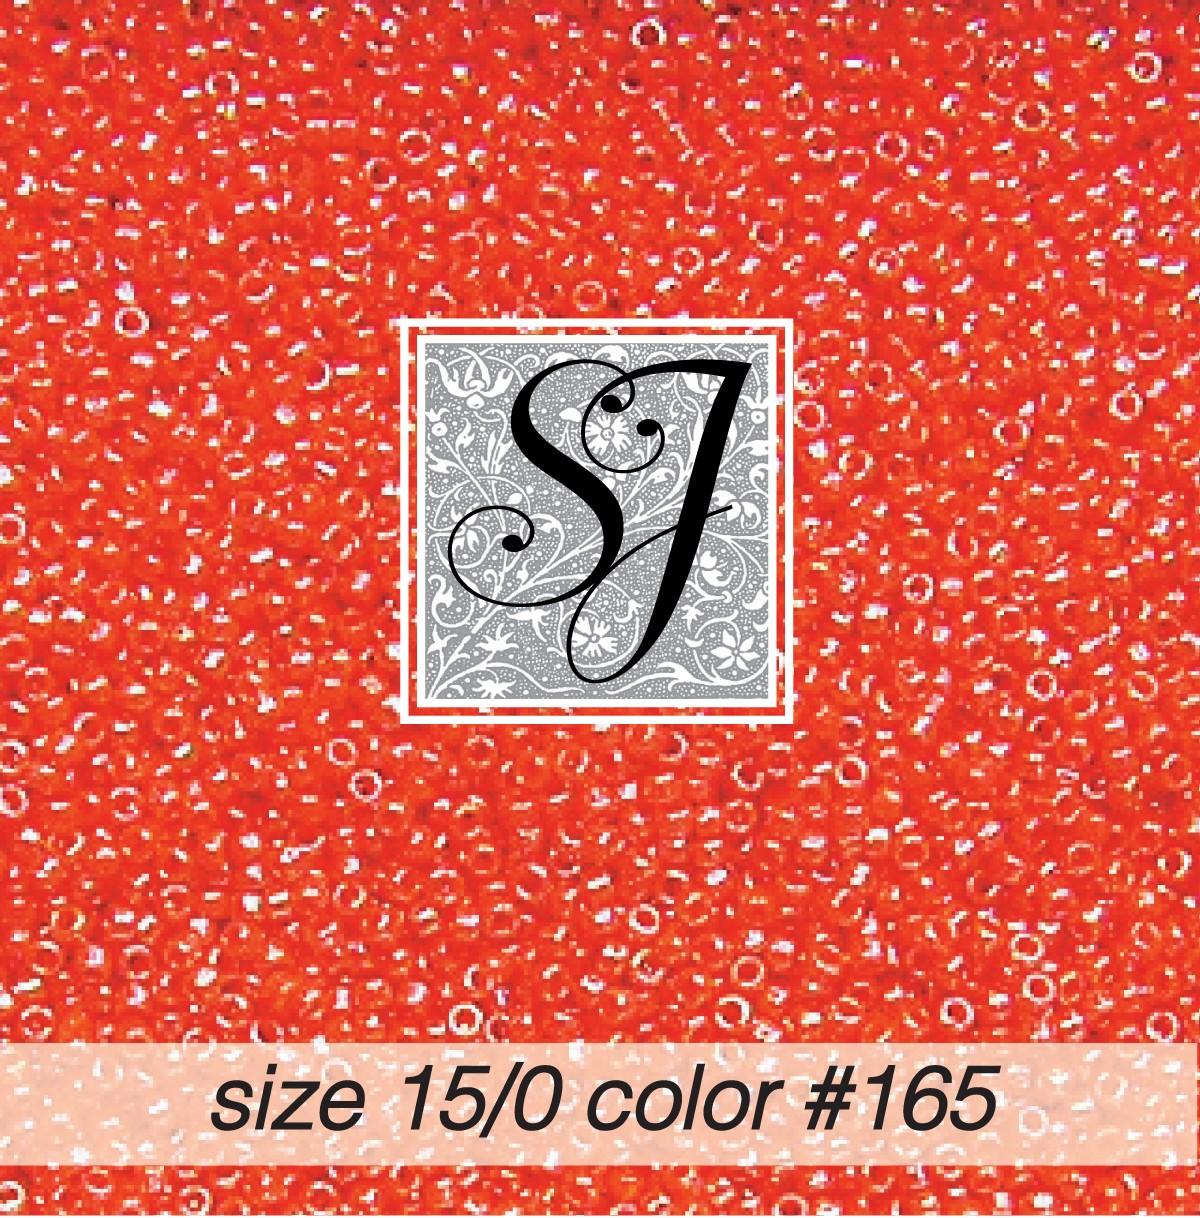 165 Persimmon Pearl 15/0 Seed Bead